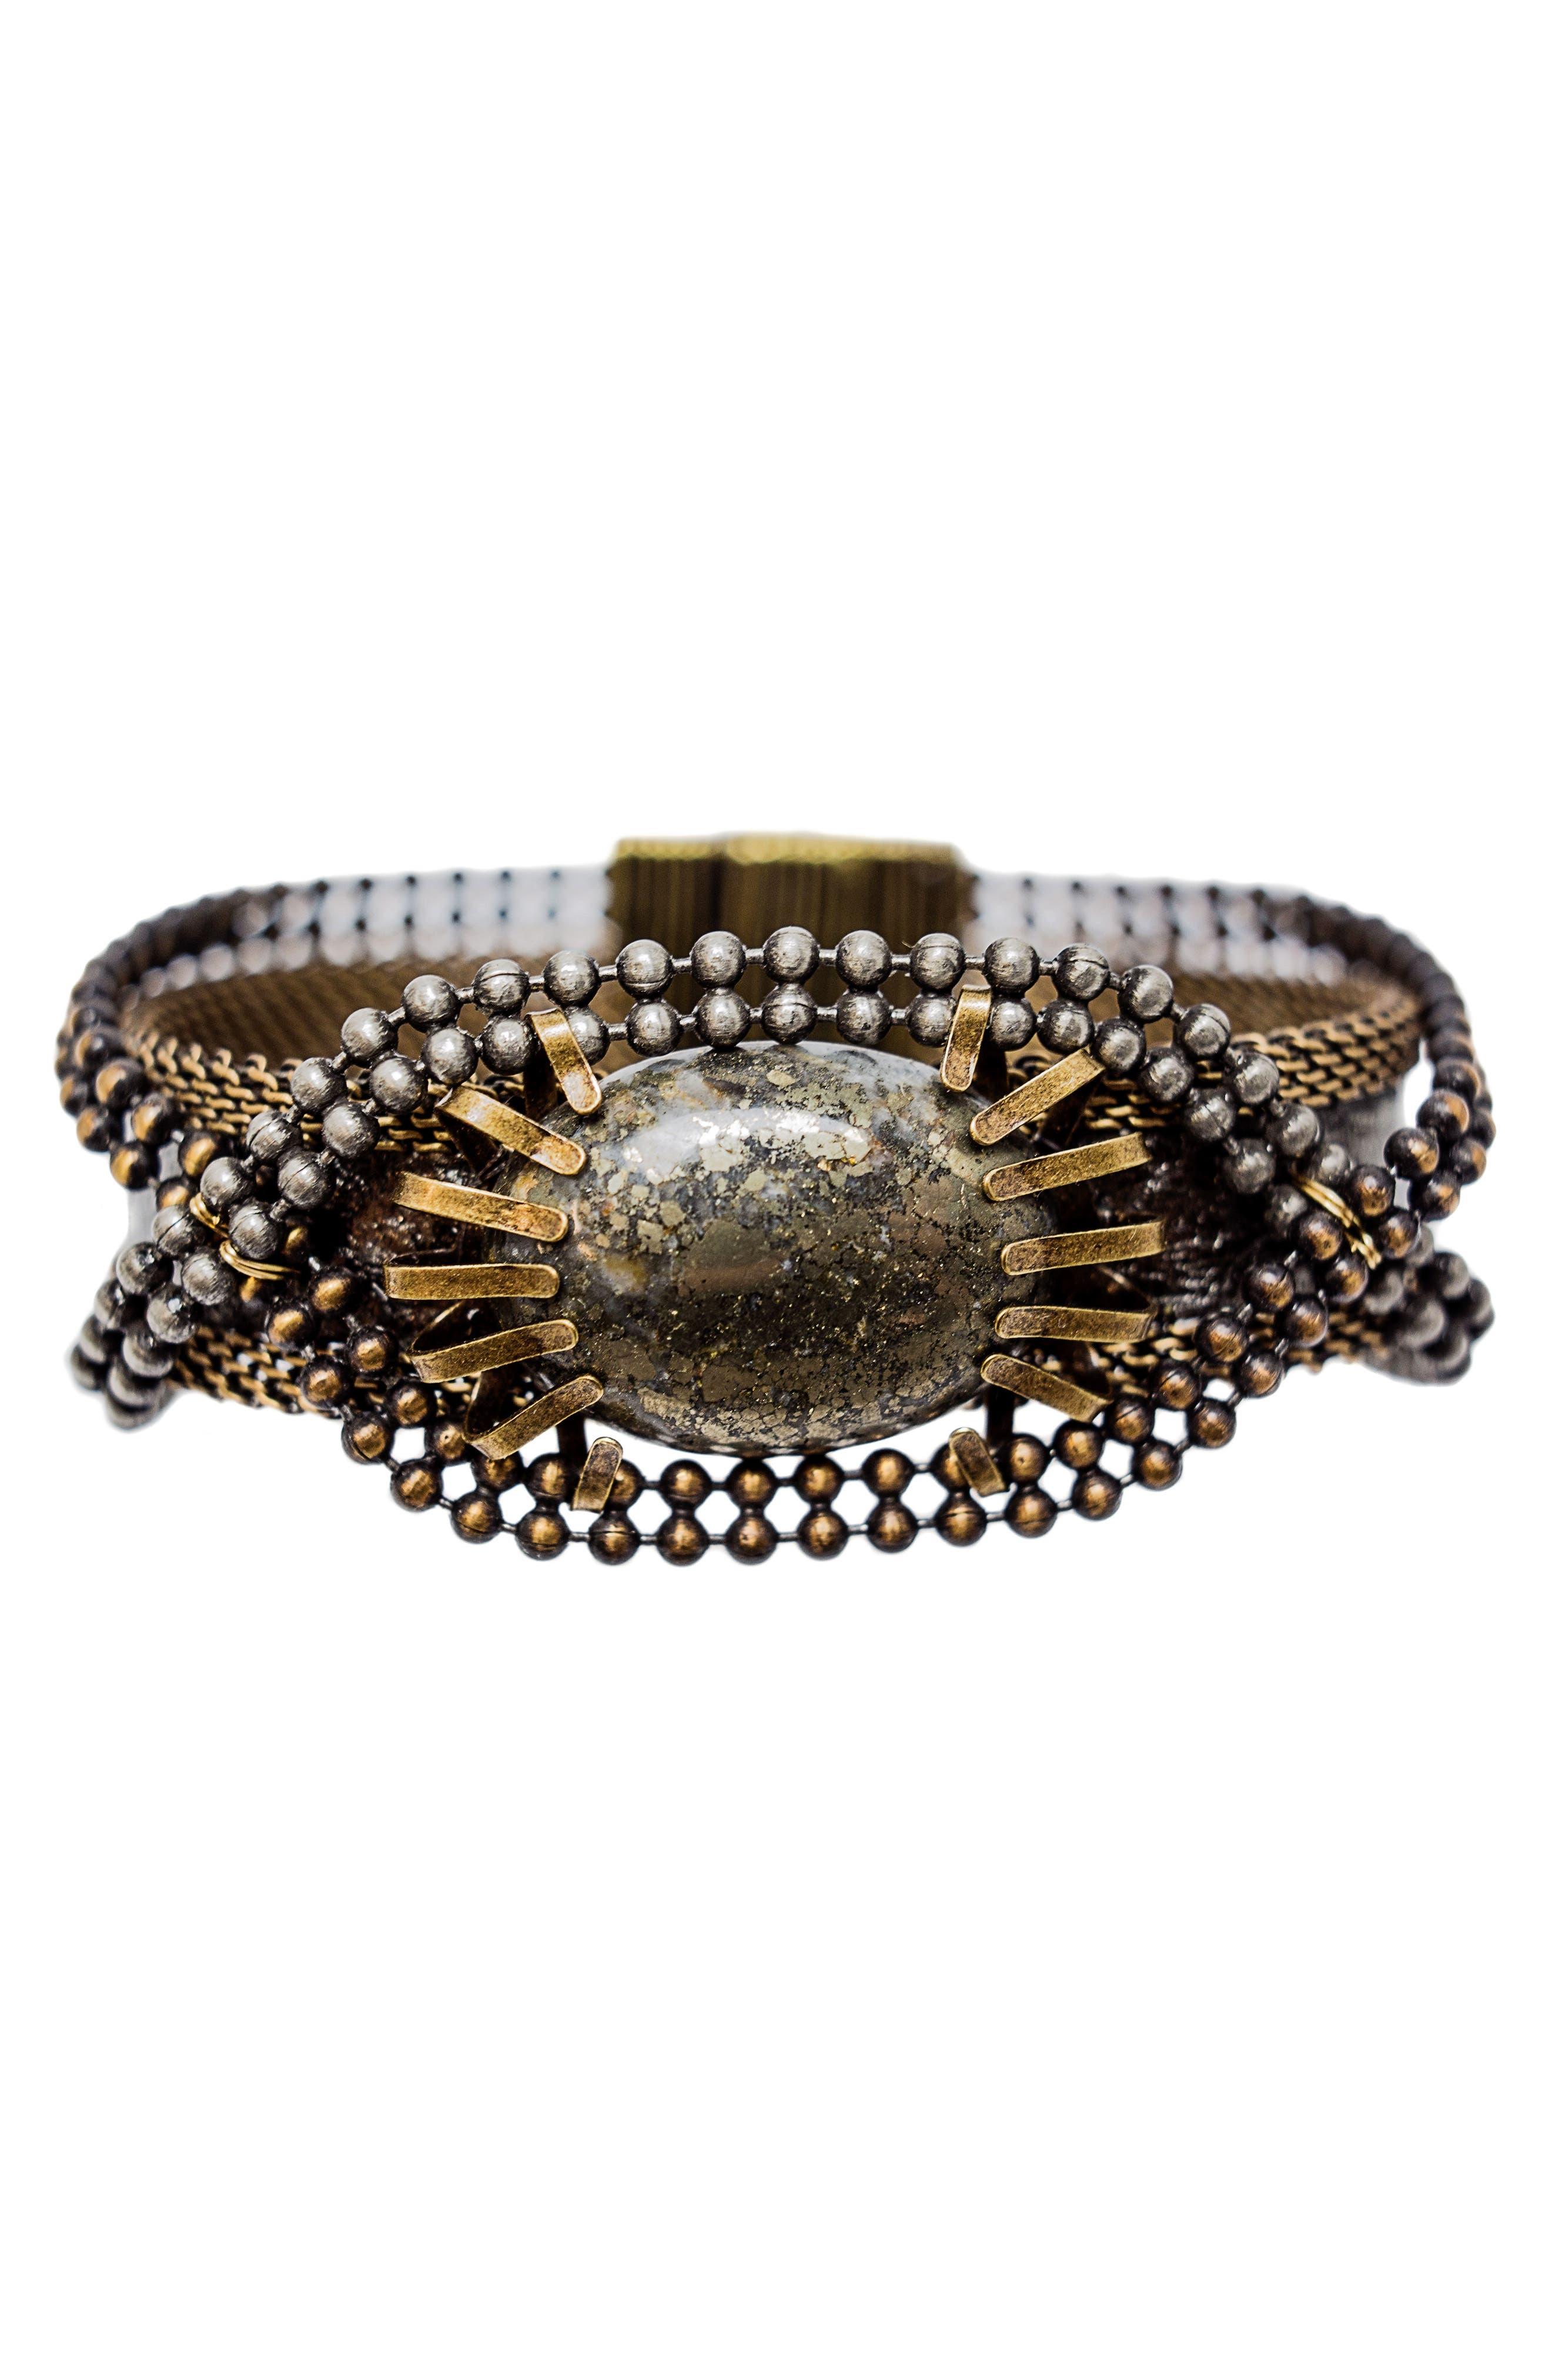 Stone & Snakeskin Bracelet,                         Main,                         color, BRONZE/ SILVER/ GOLD